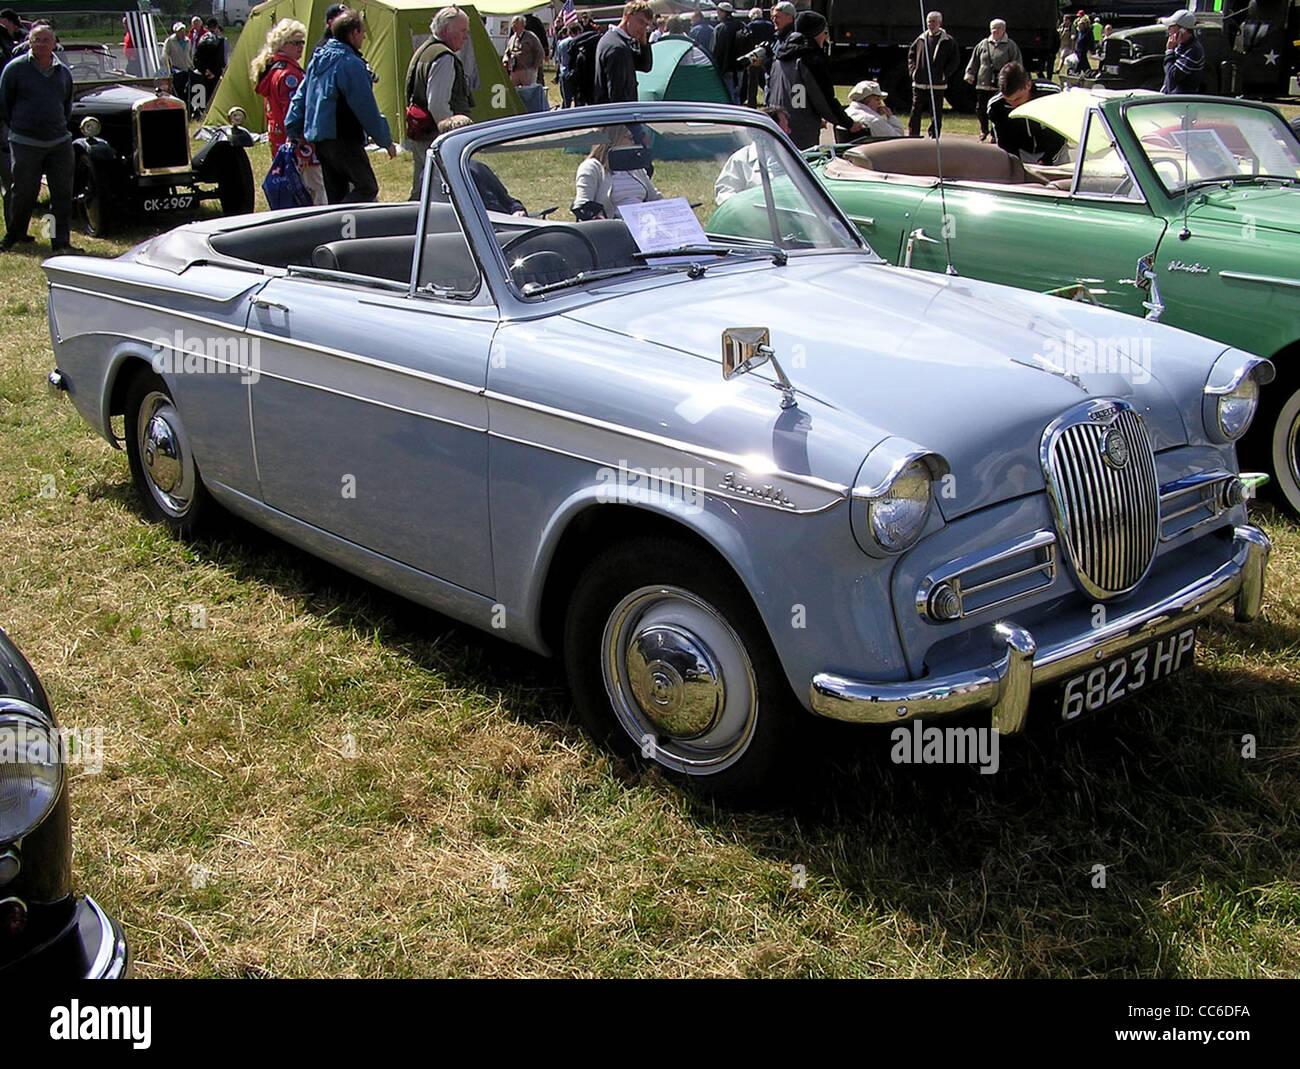 1960 Singer Gazelle Convertible at Yate Car Show, Yate, Bristol, England. - Stock Image